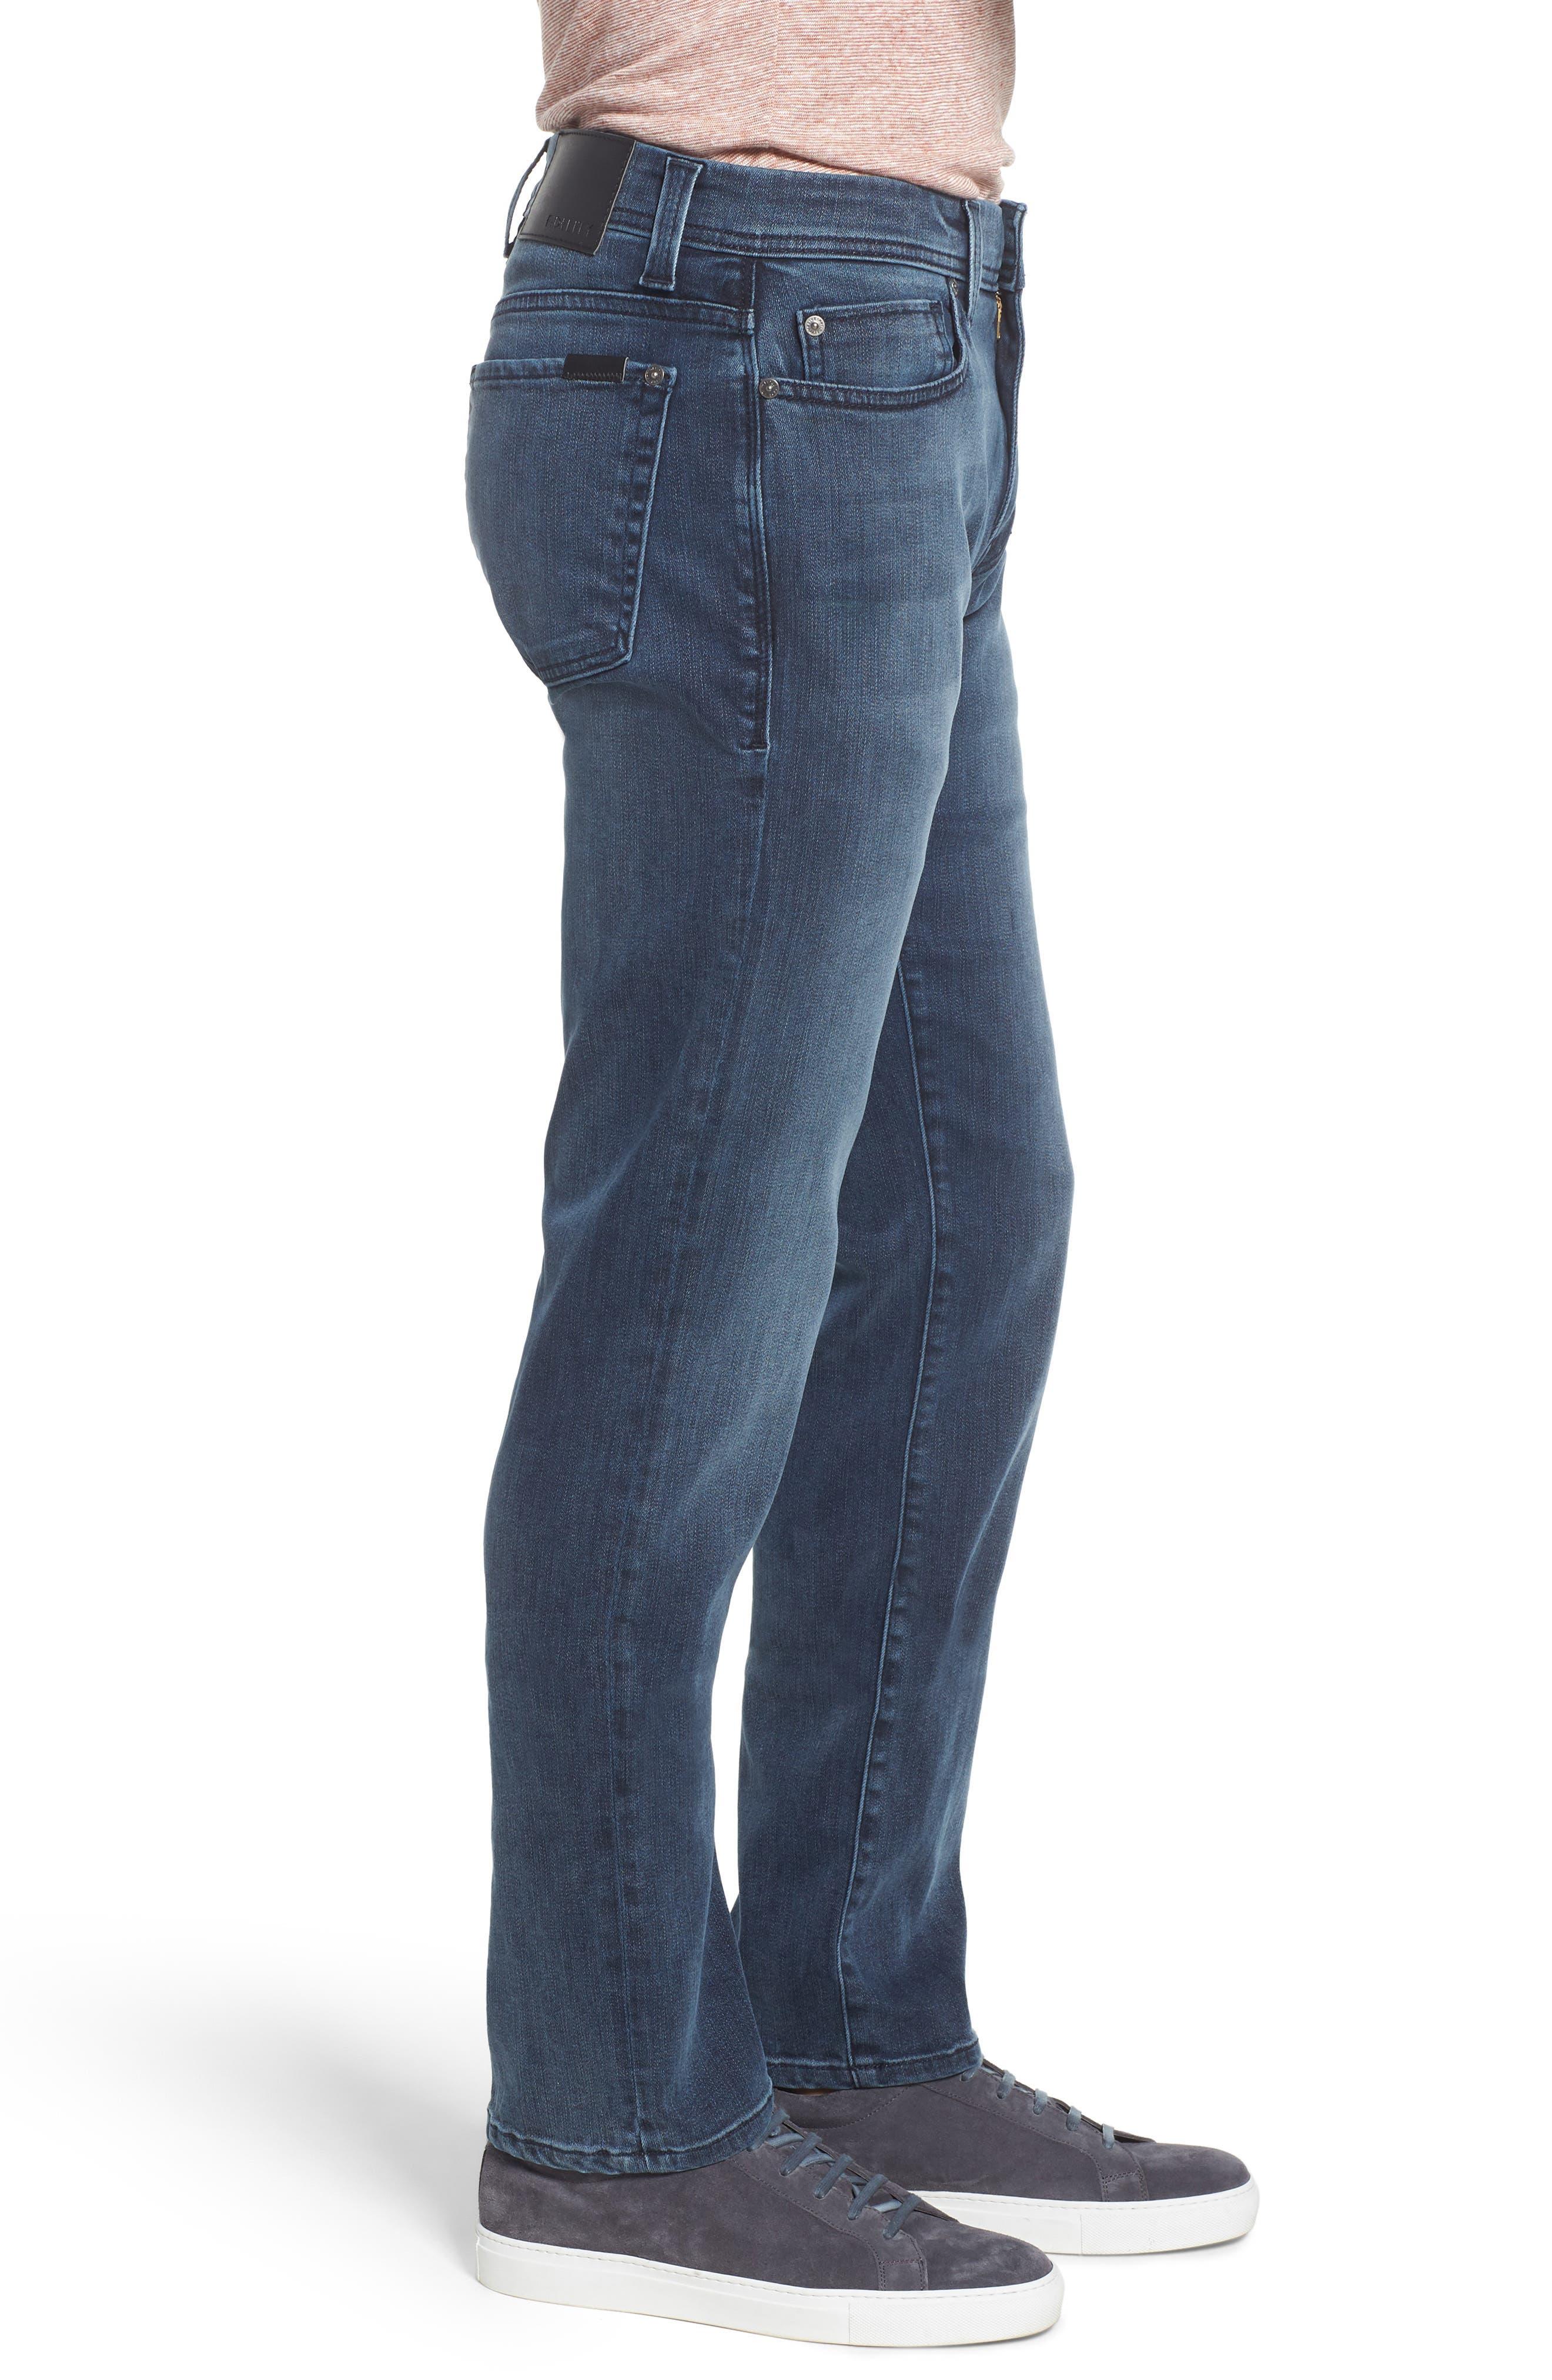 Jimmy Slim Straight Leg Jeans,                             Alternate thumbnail 3, color,                             Lexicon